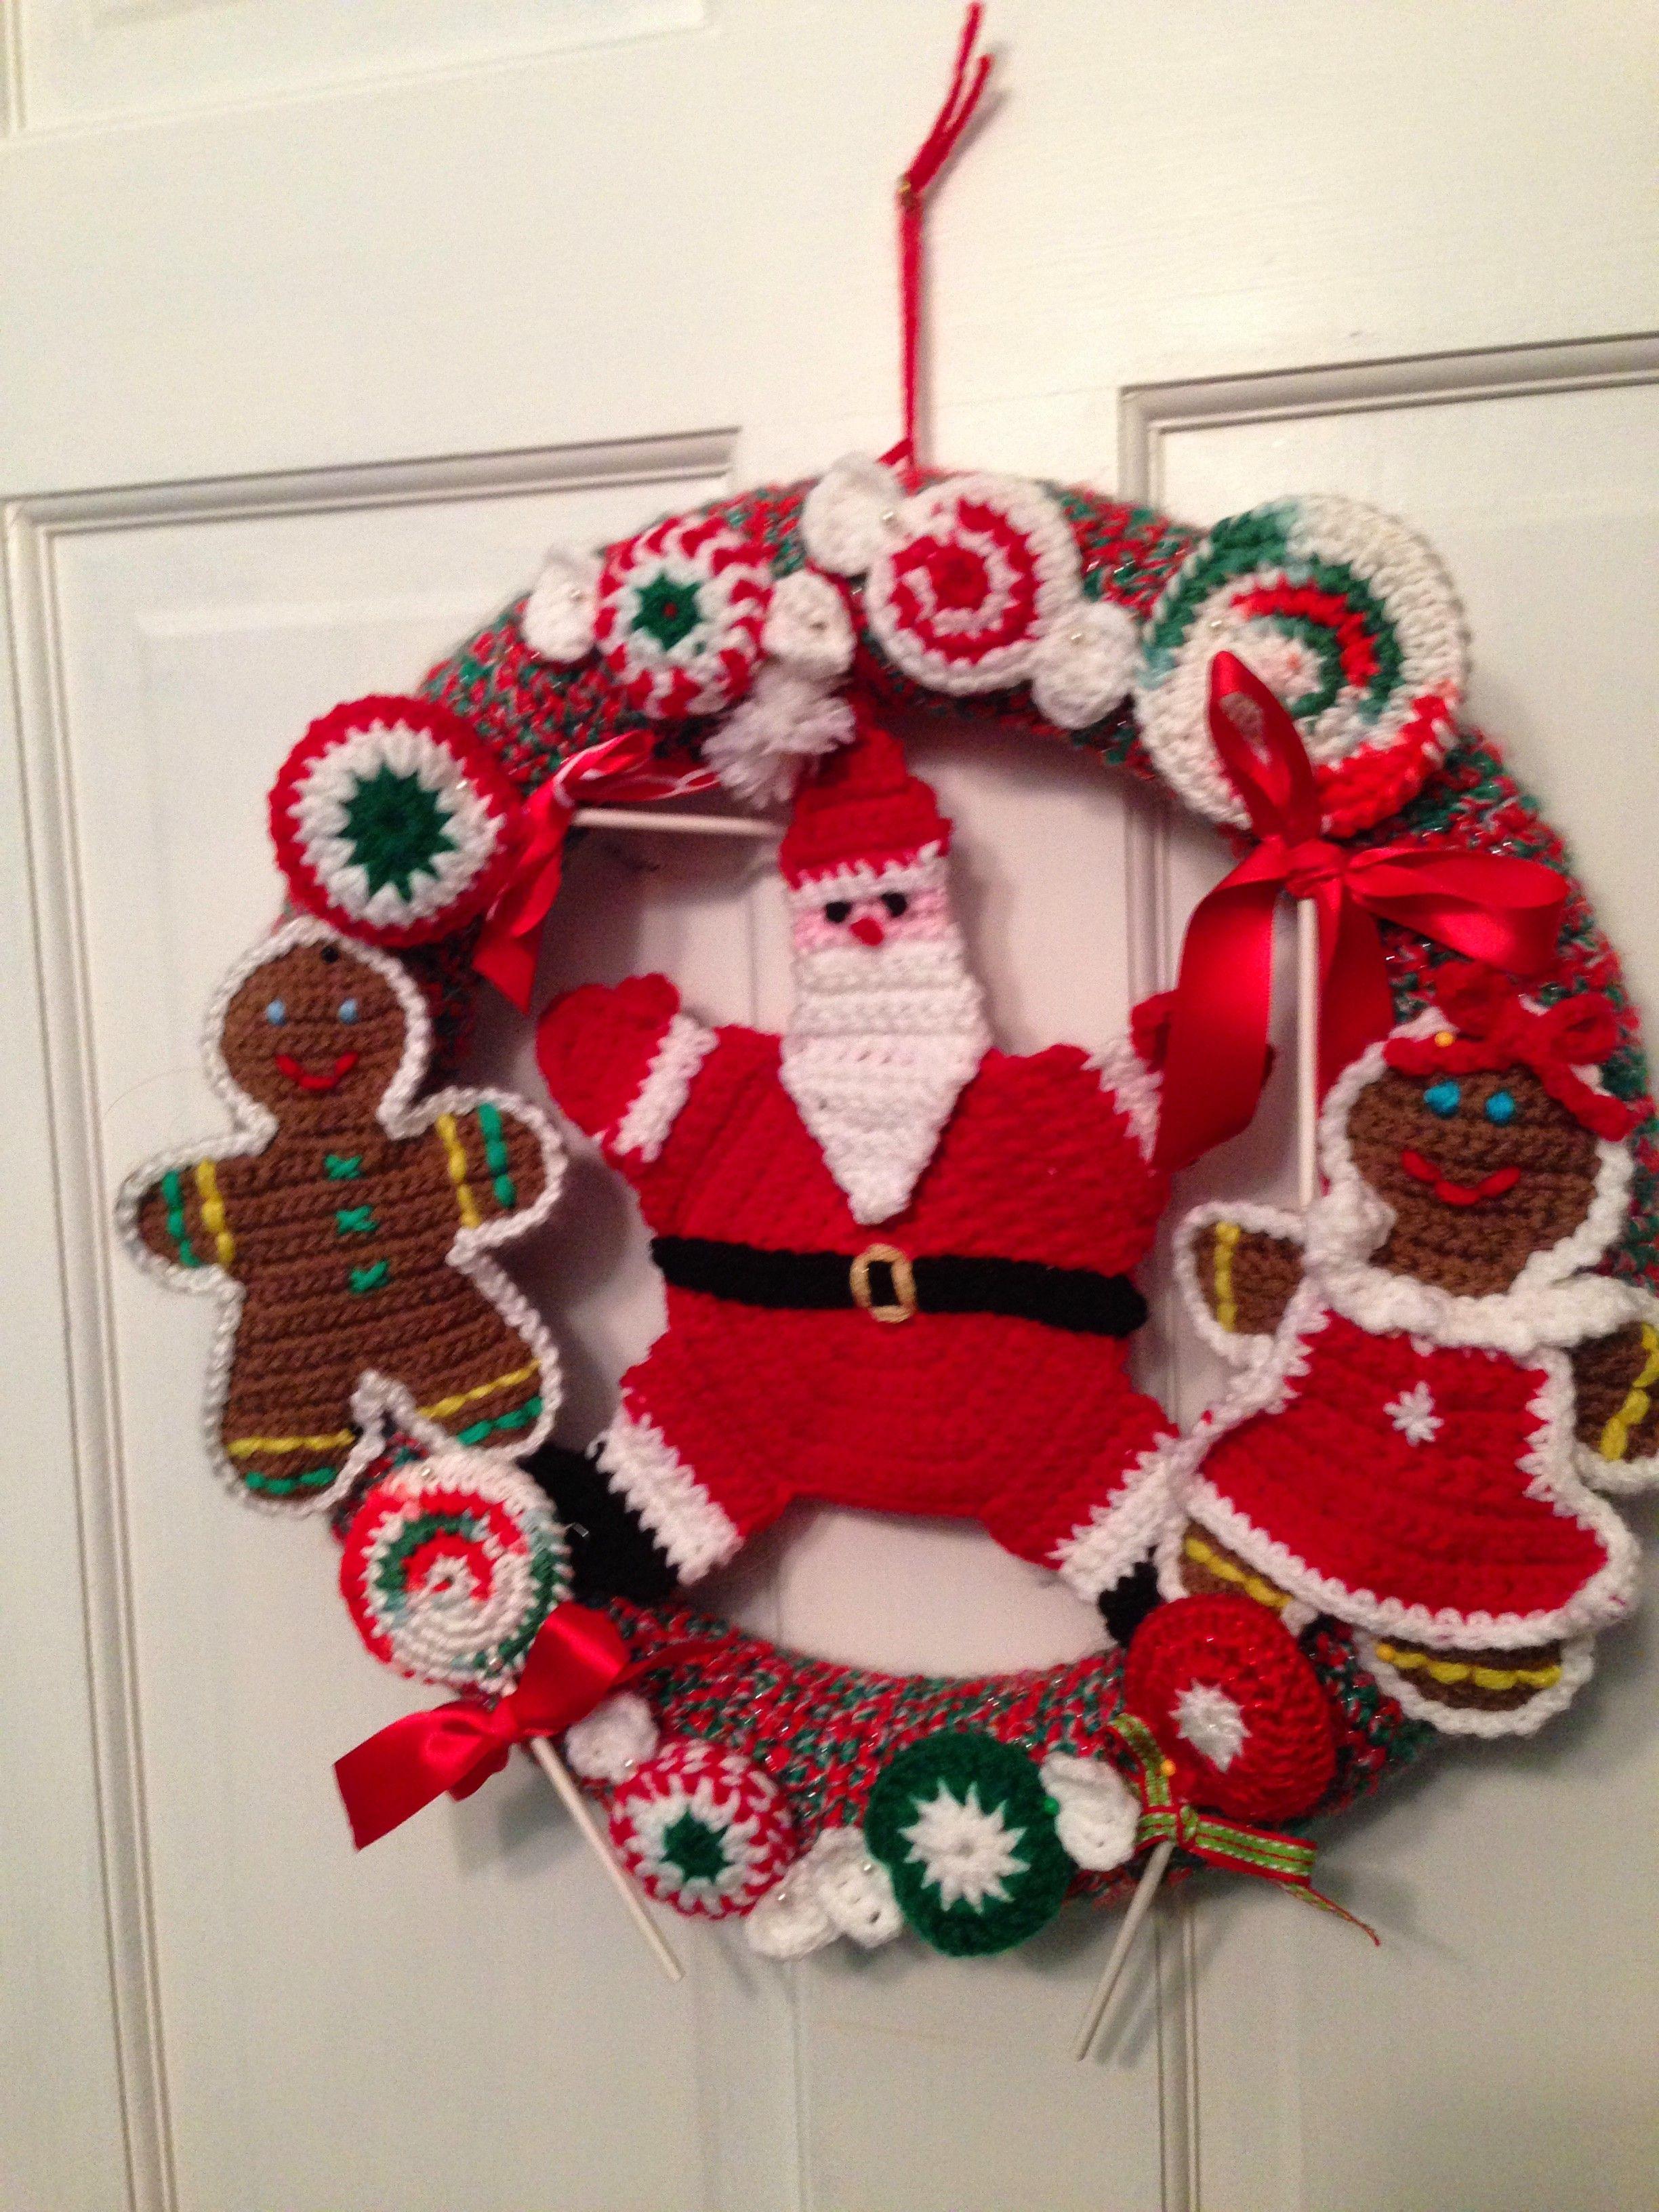 Crocheted Wreath Gingerbread/Candy Wreath | Crocheted Wreaths ...